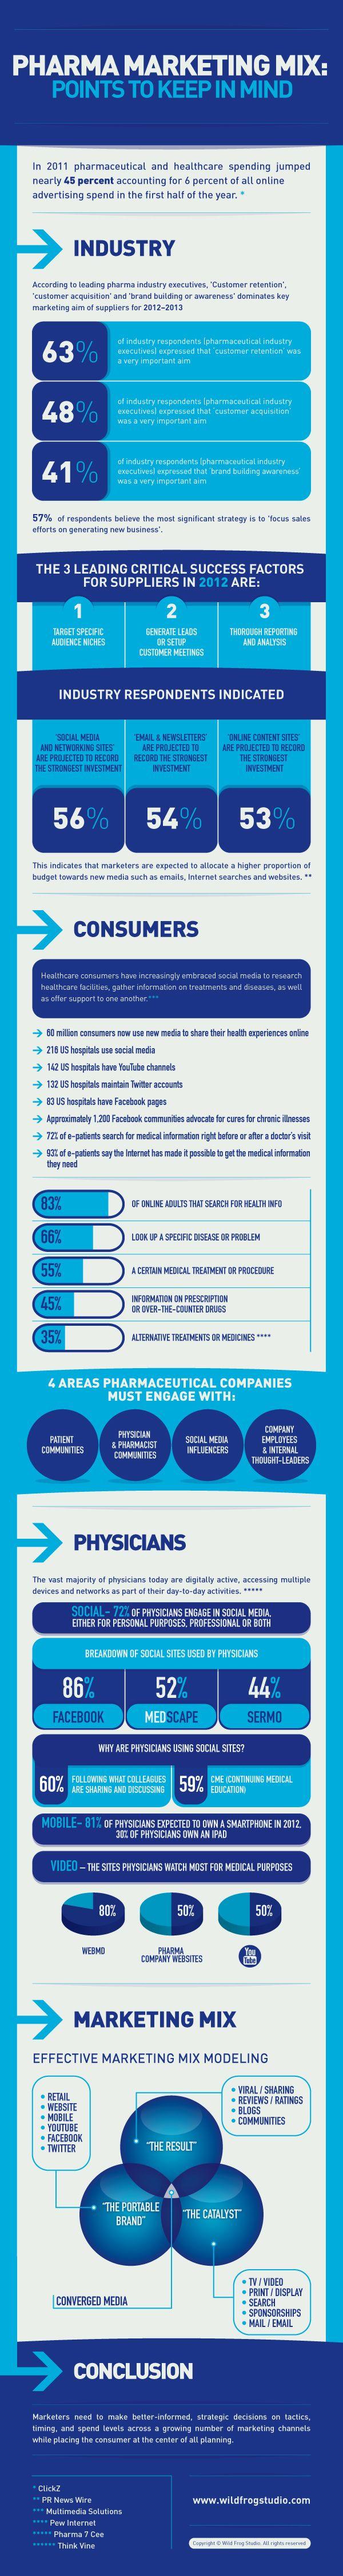 Pharma marketing mix infographic